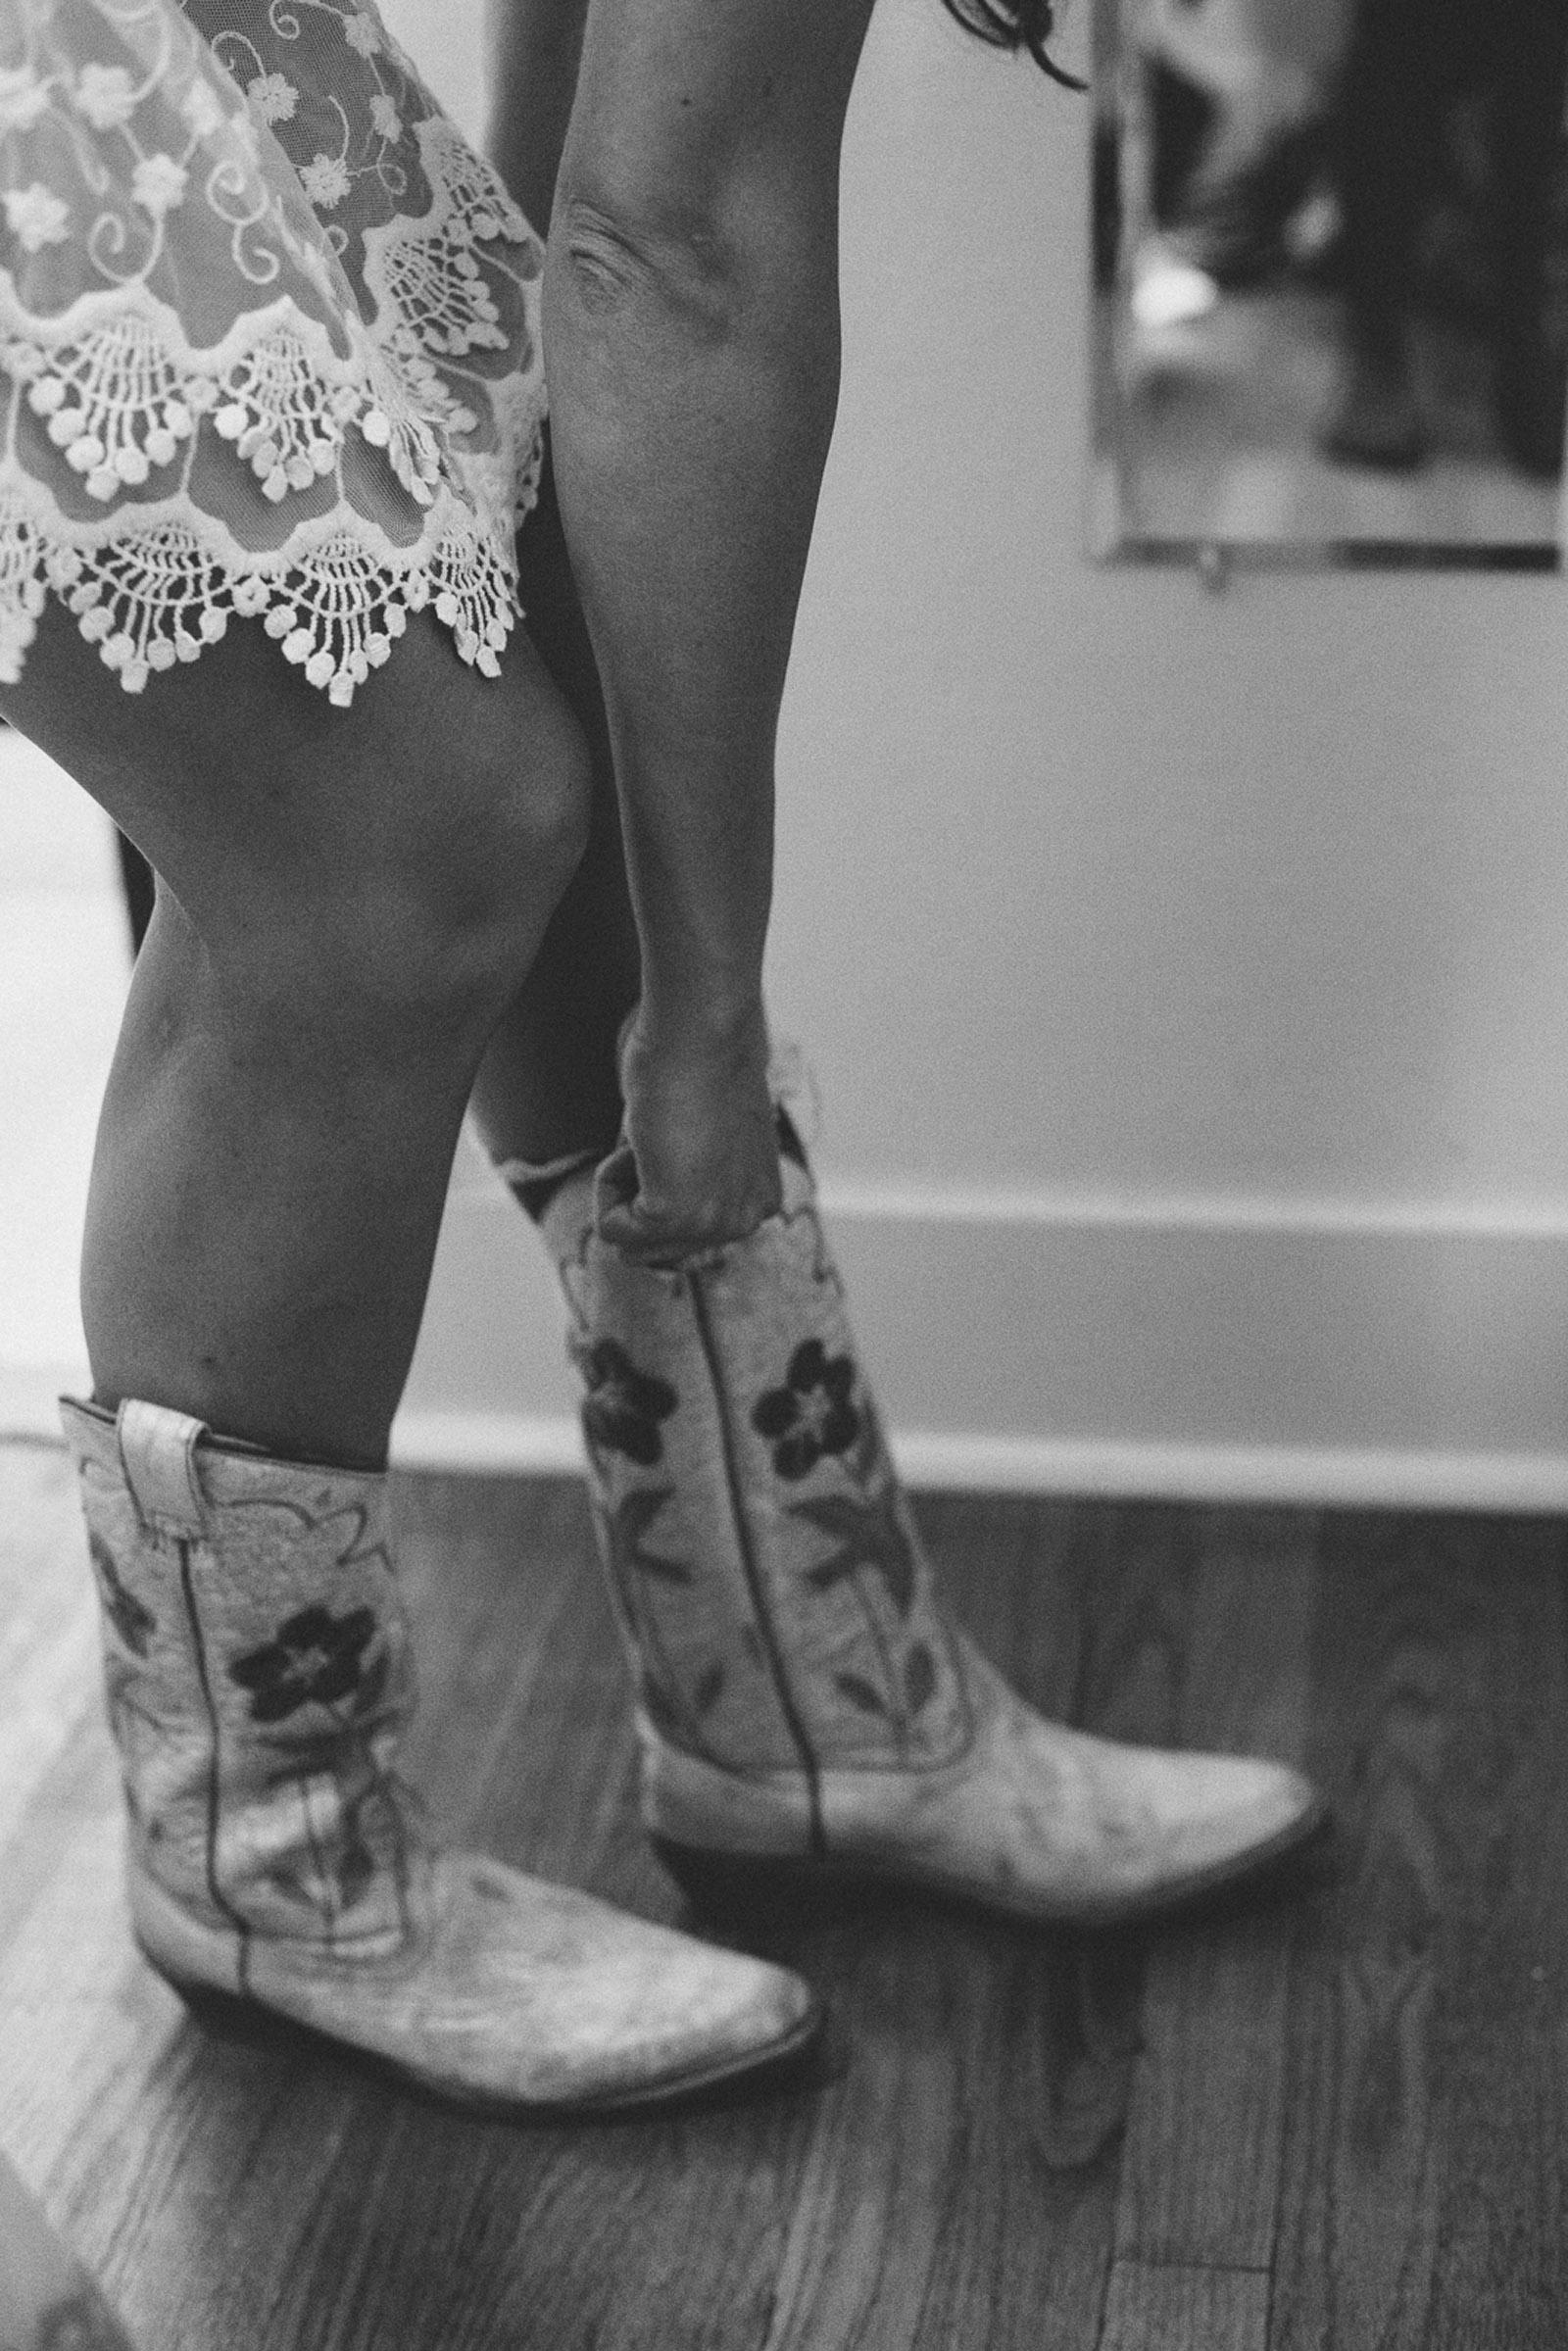 durango wedding dress bride boots